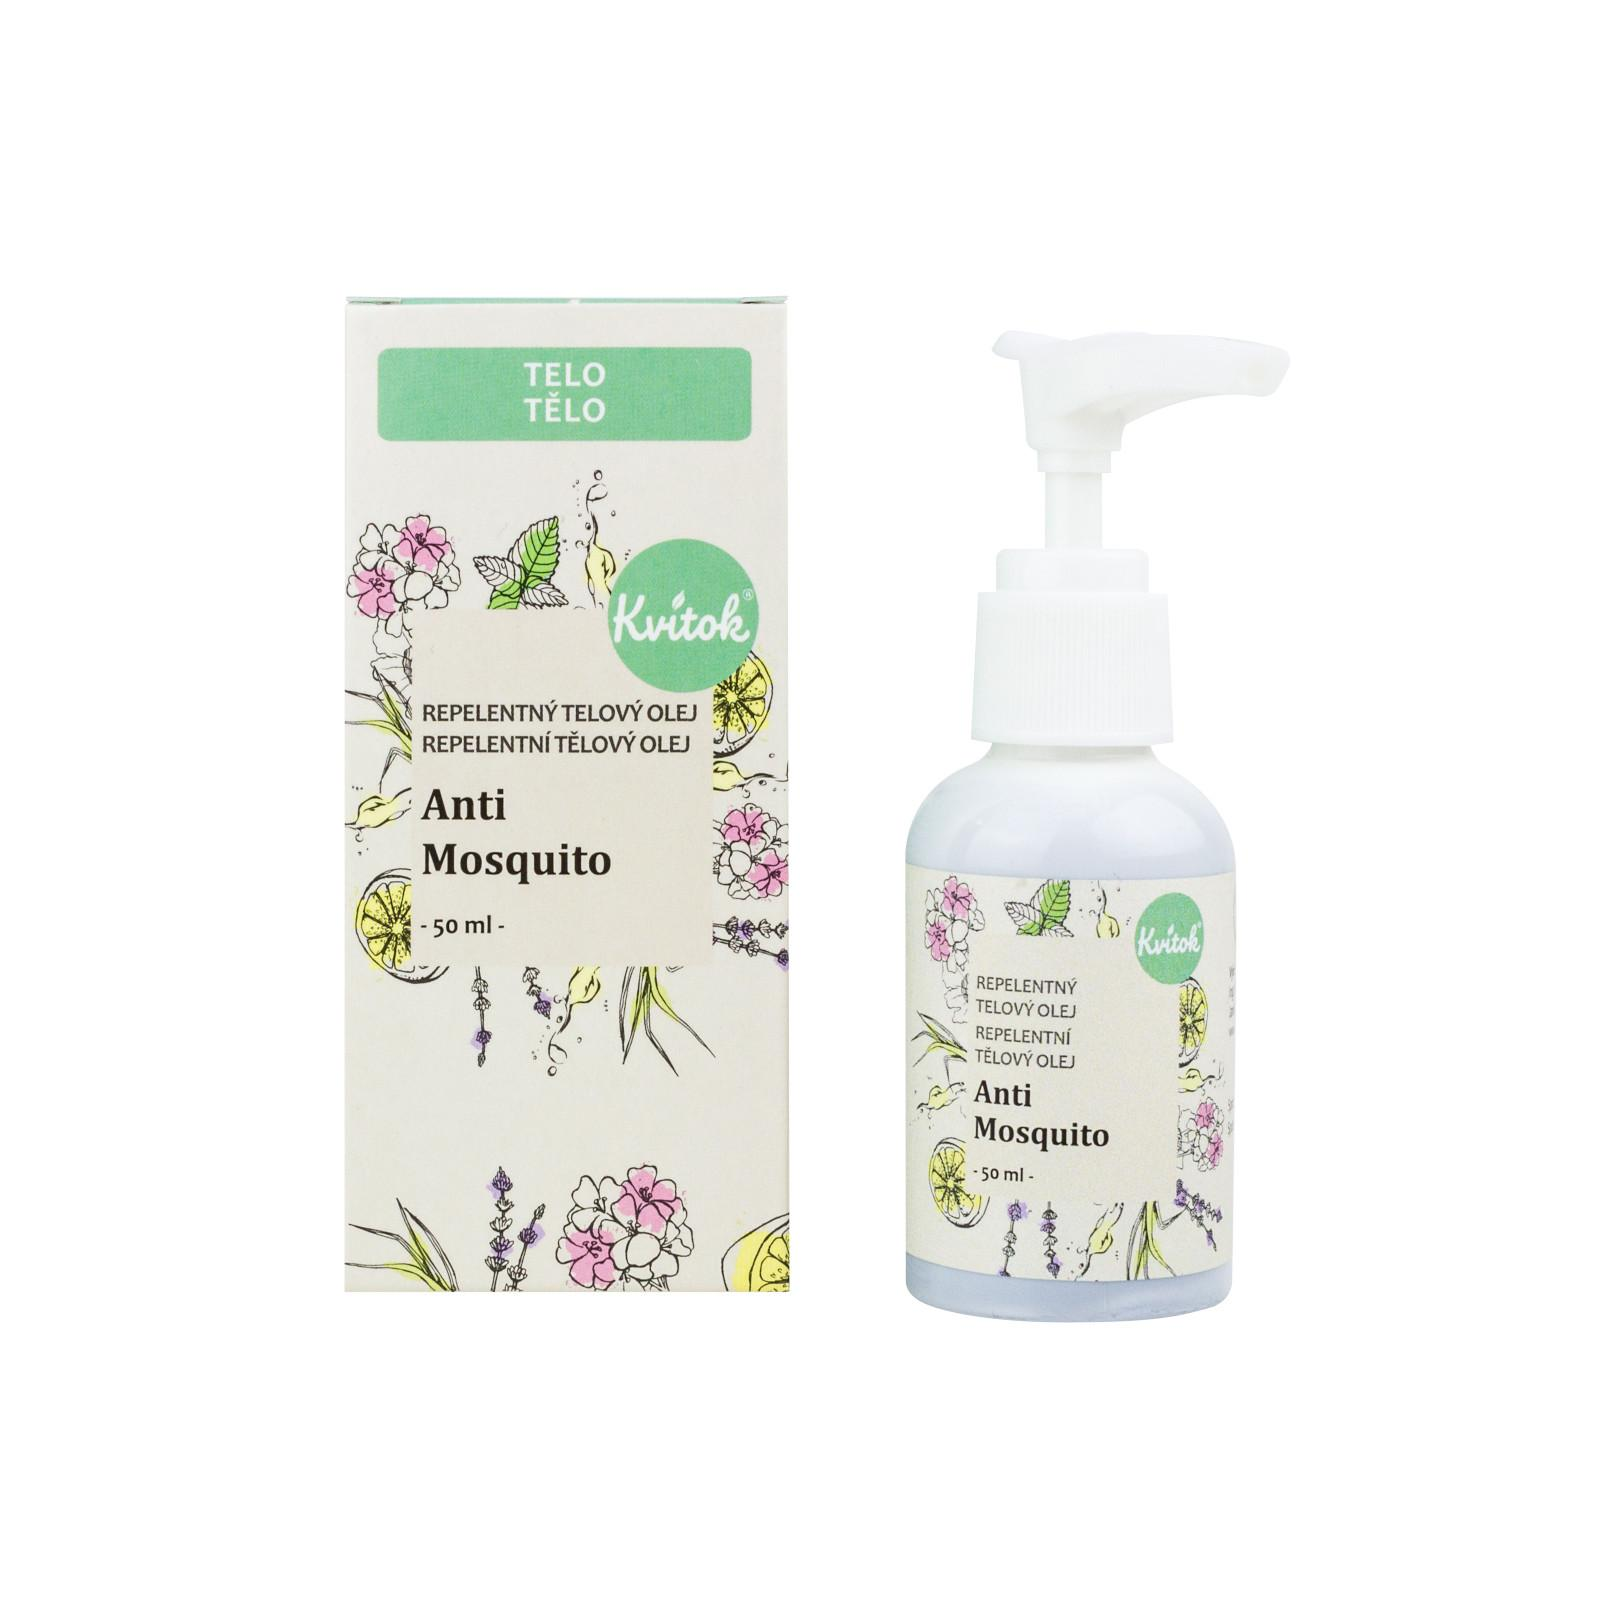 Kvitok Repelentní tělový olej, Anti mosquito 50 ml